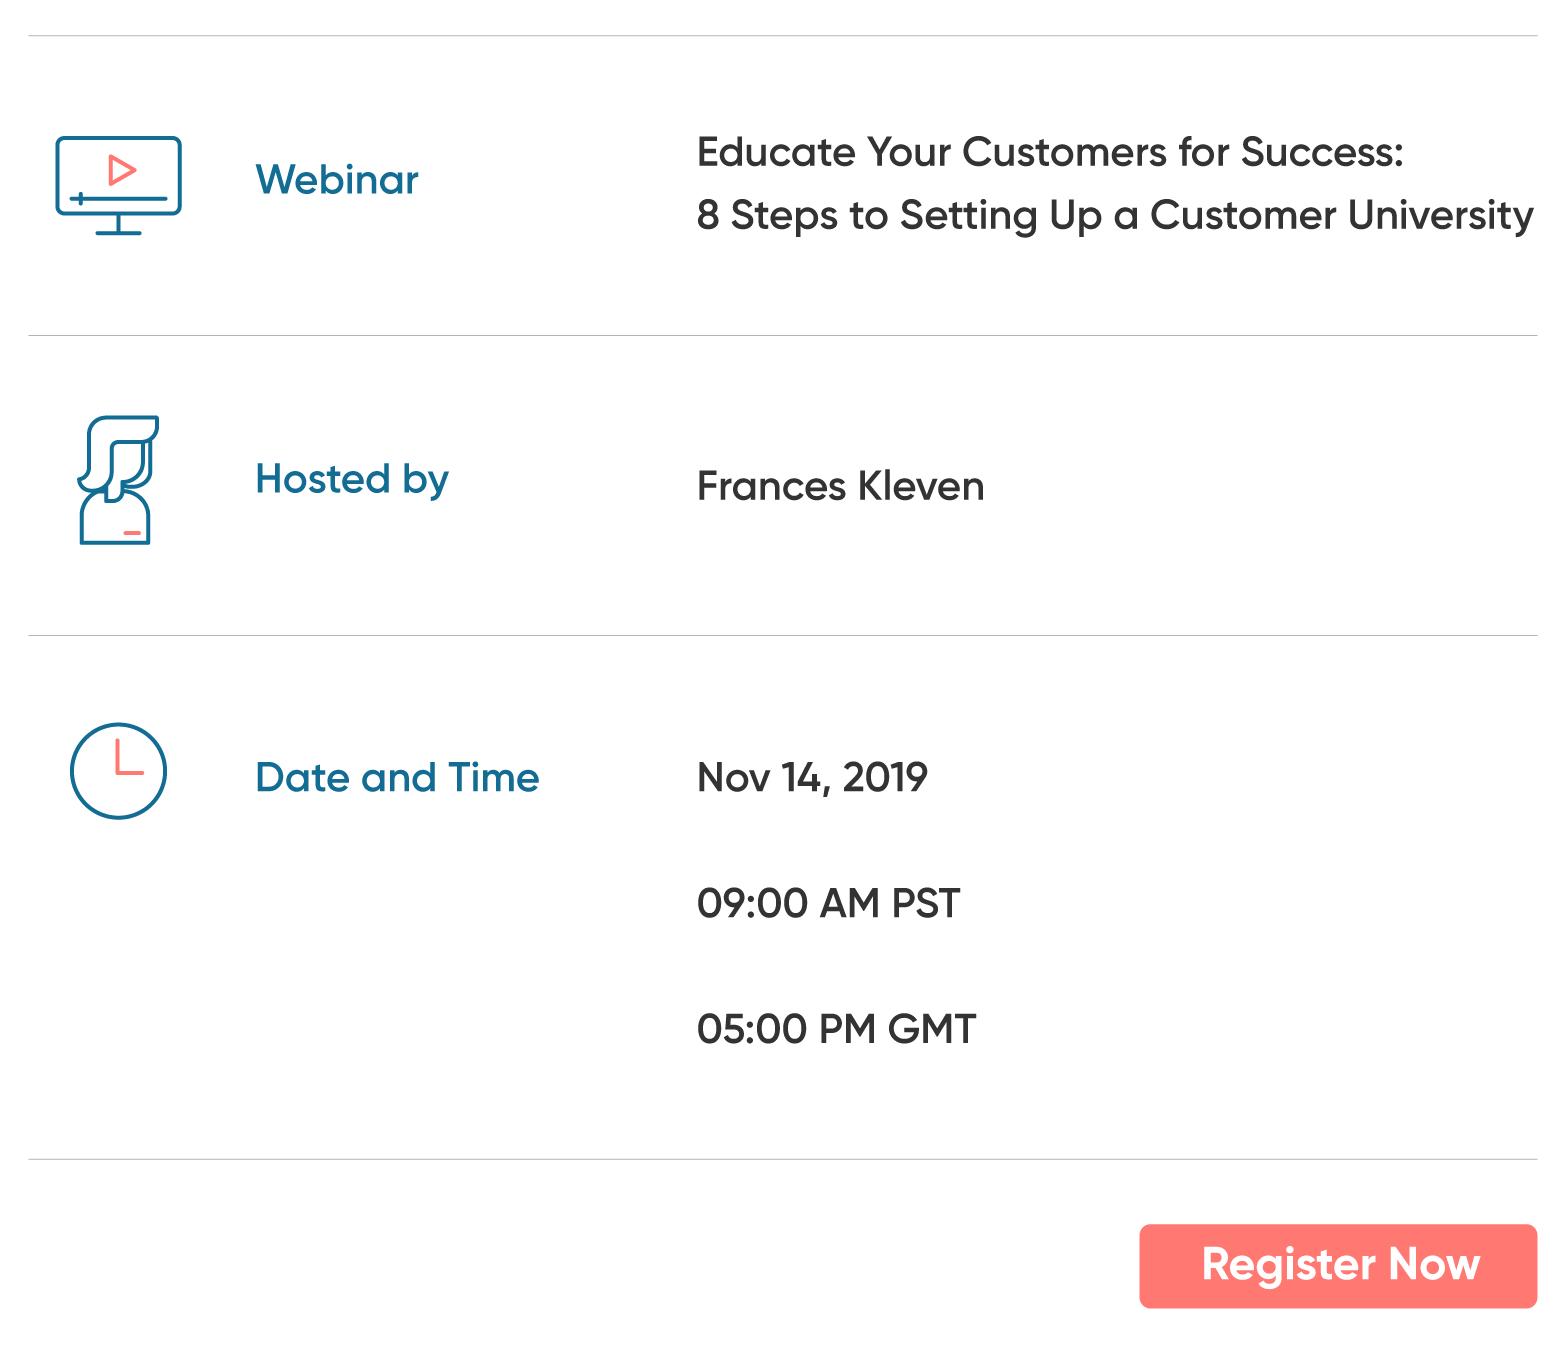 Customer University Webinar Details